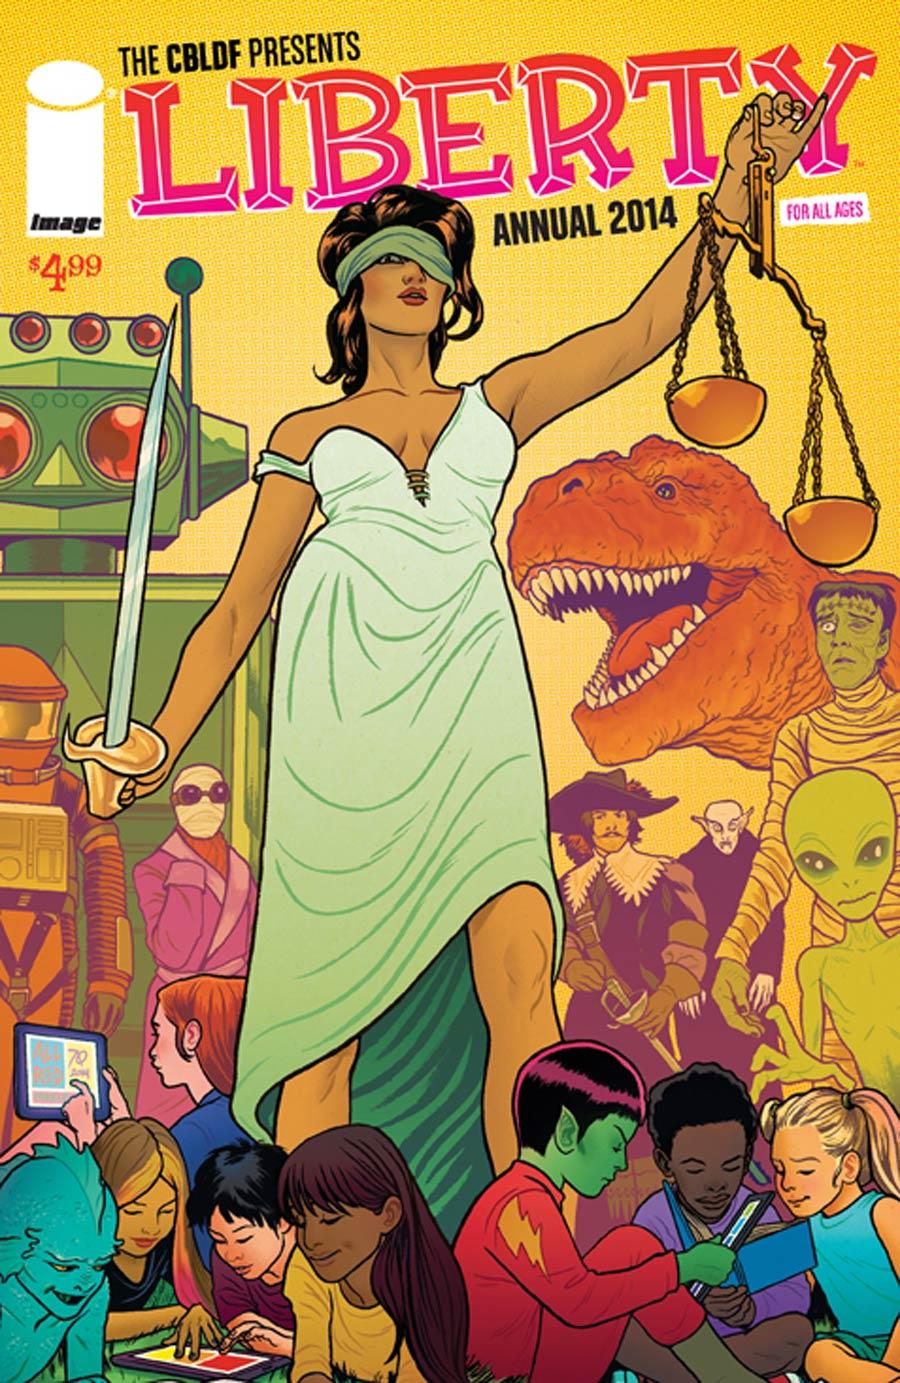 CBLDF Liberty Annual 2014 Cover A Mike Allred Joe Quinones Maris Wicks